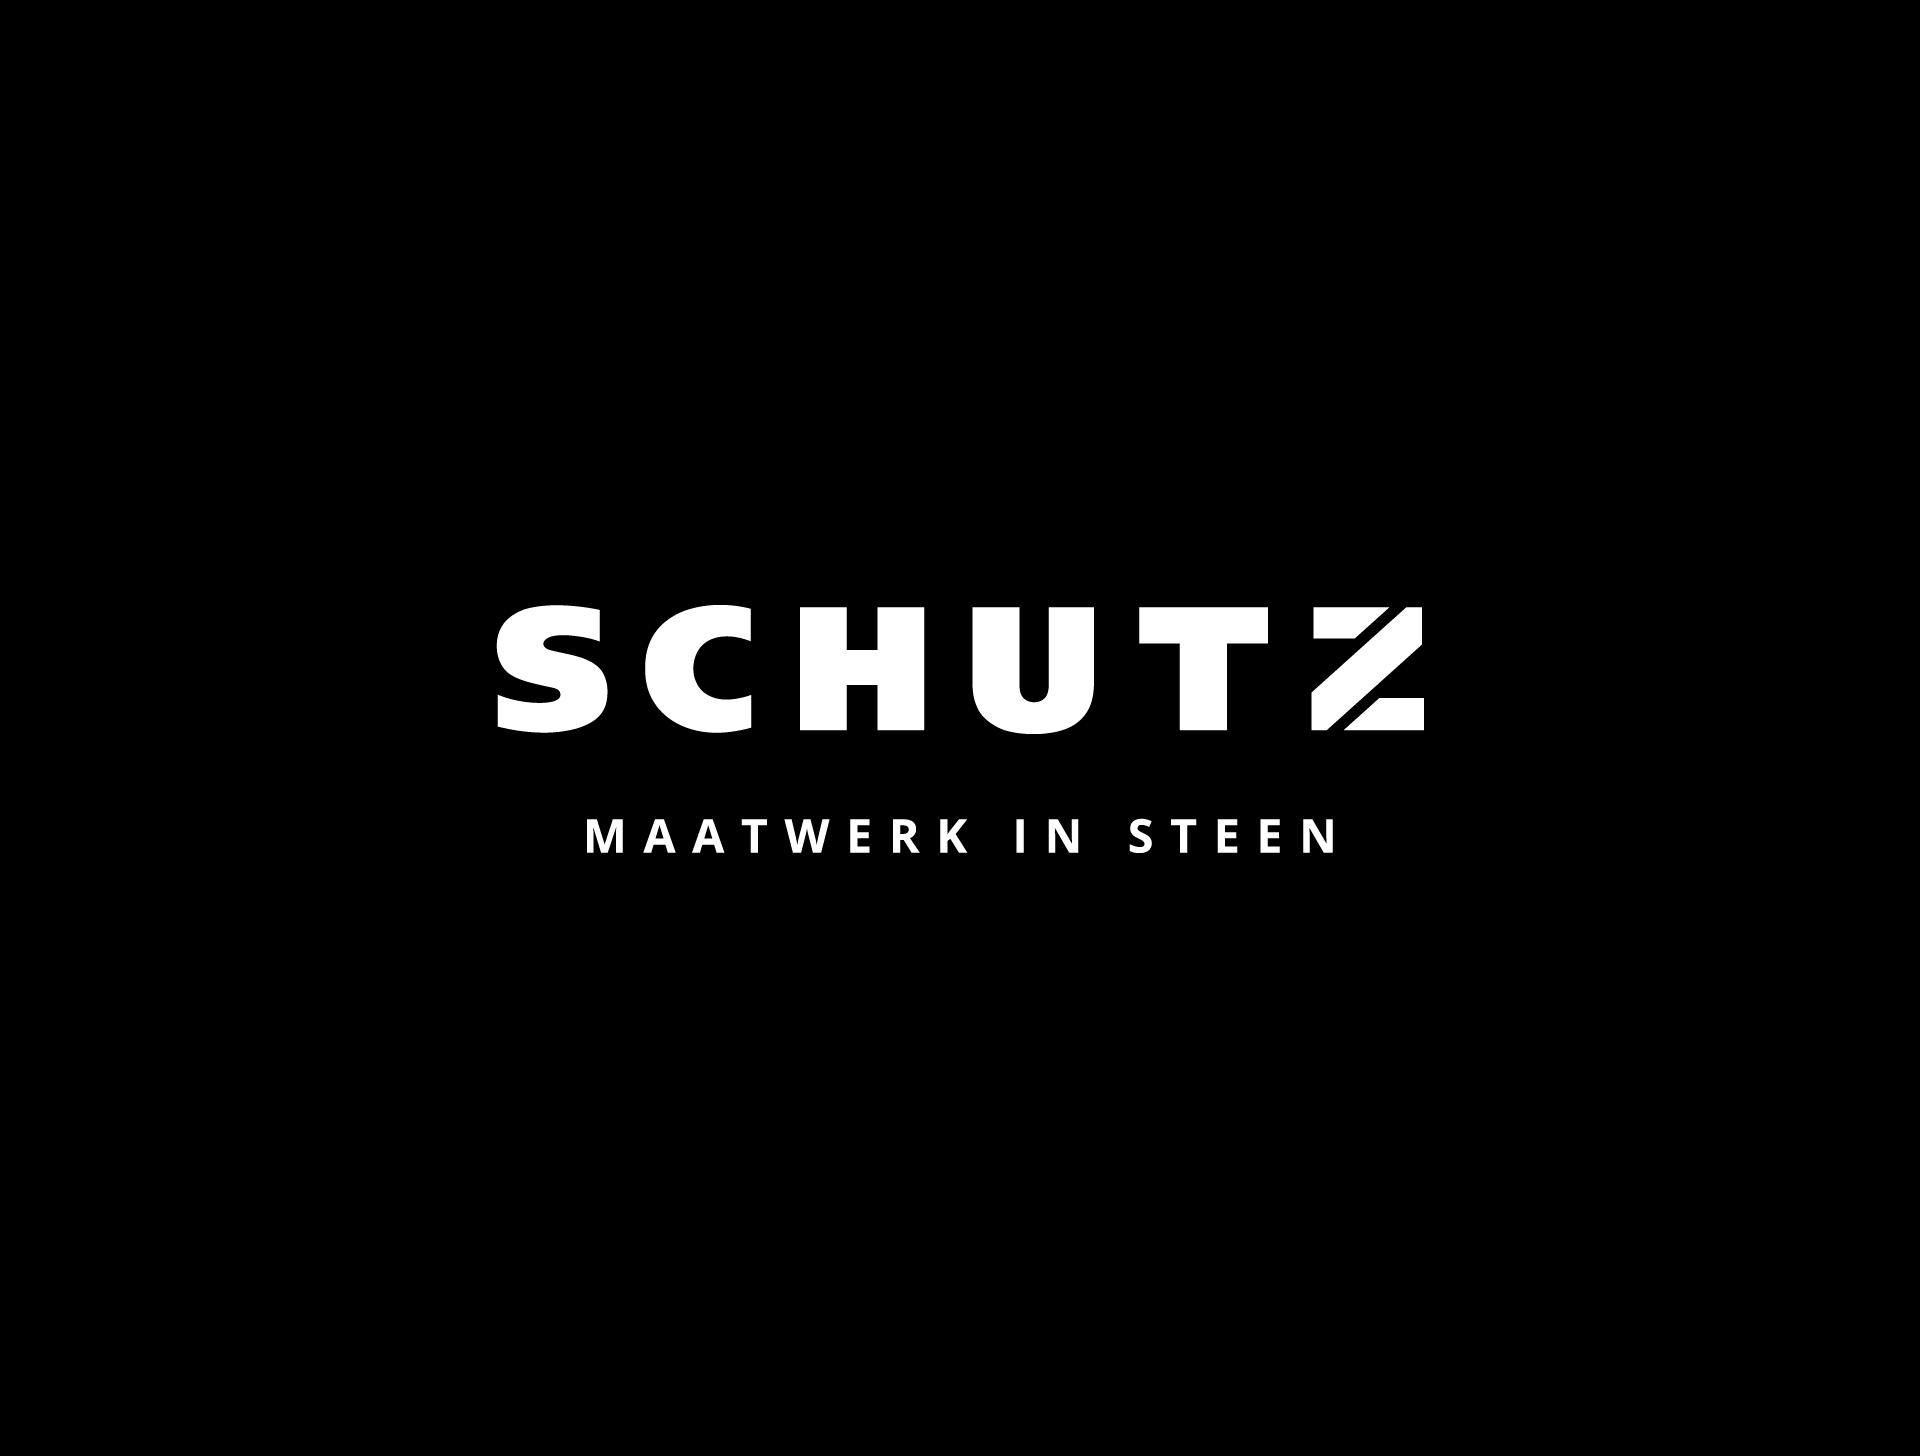 Schutz - corporate identity